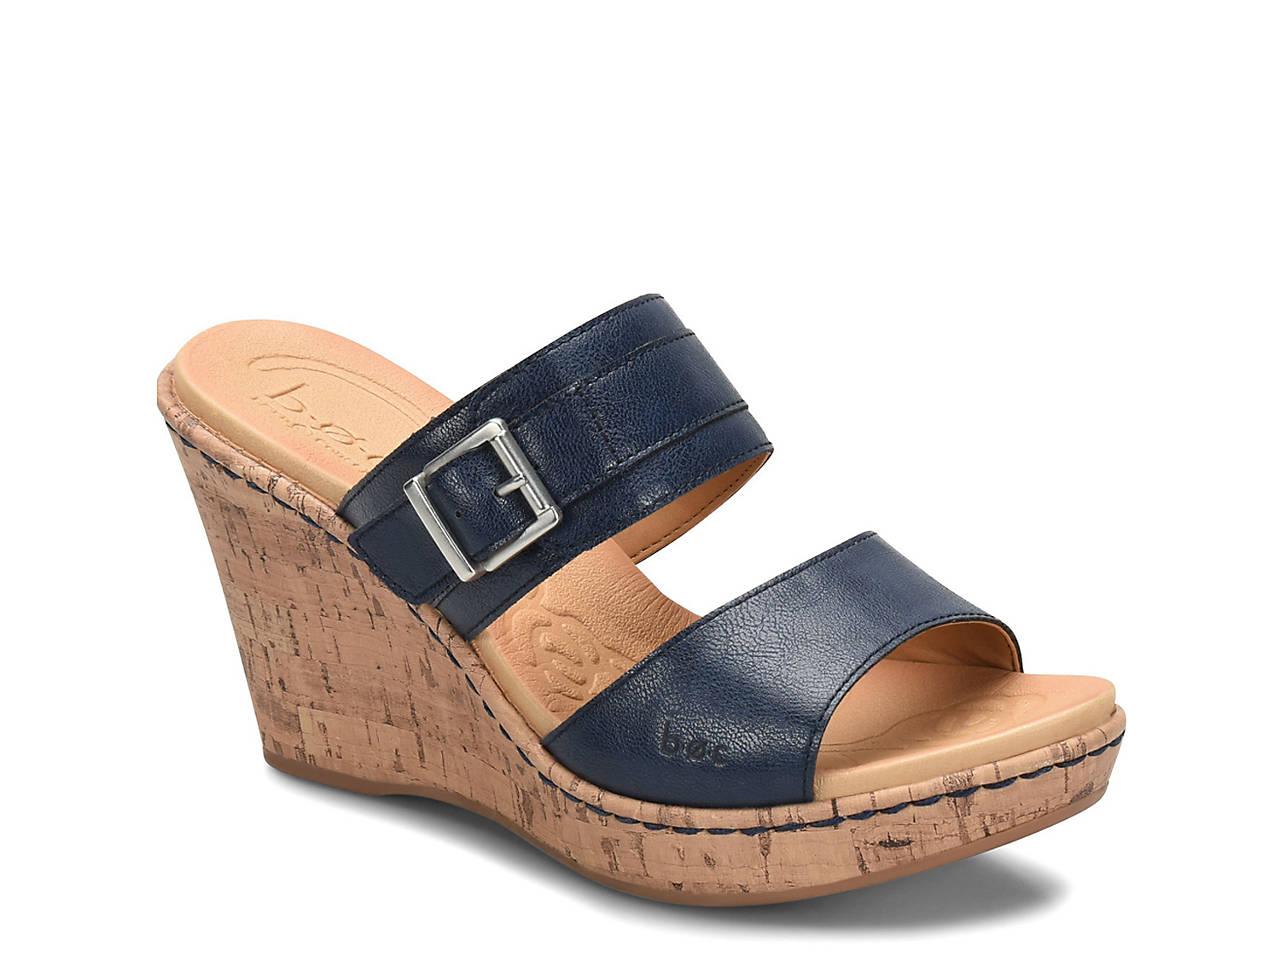 a5cc94dd23 b.o.c Pounce Wedge Sandal Women's Shoes | DSW